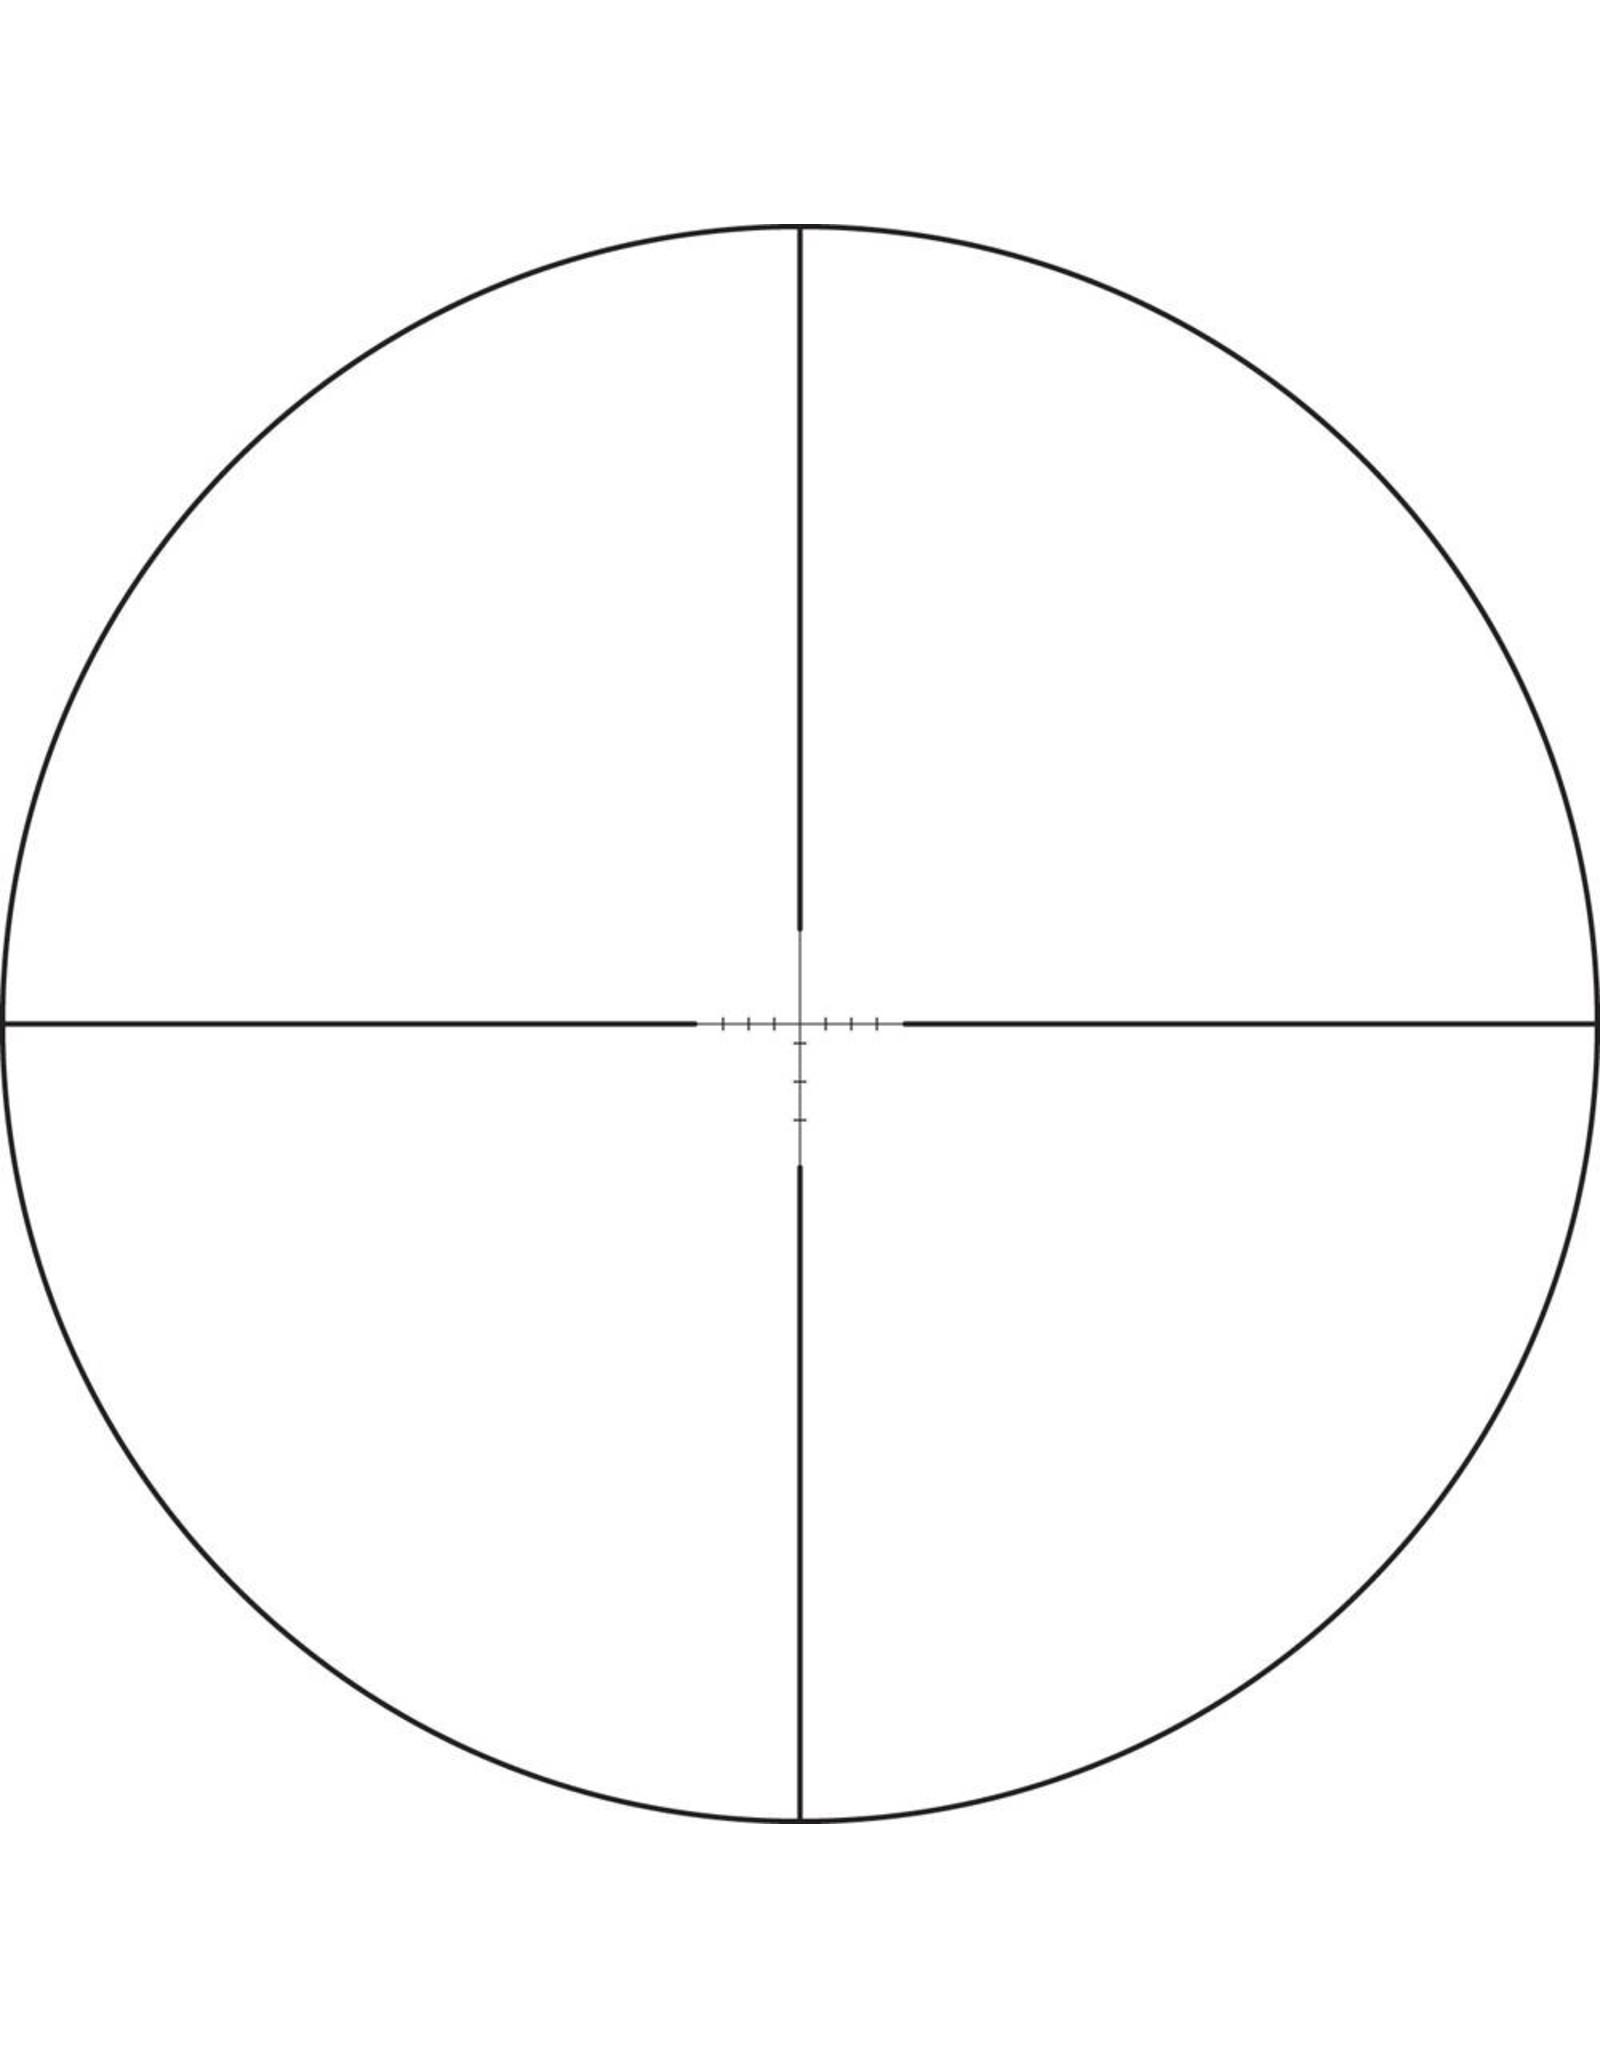 Vortex Vortex Crossfire II 4-12x50 AO Riflescope (1-Inch) BDC